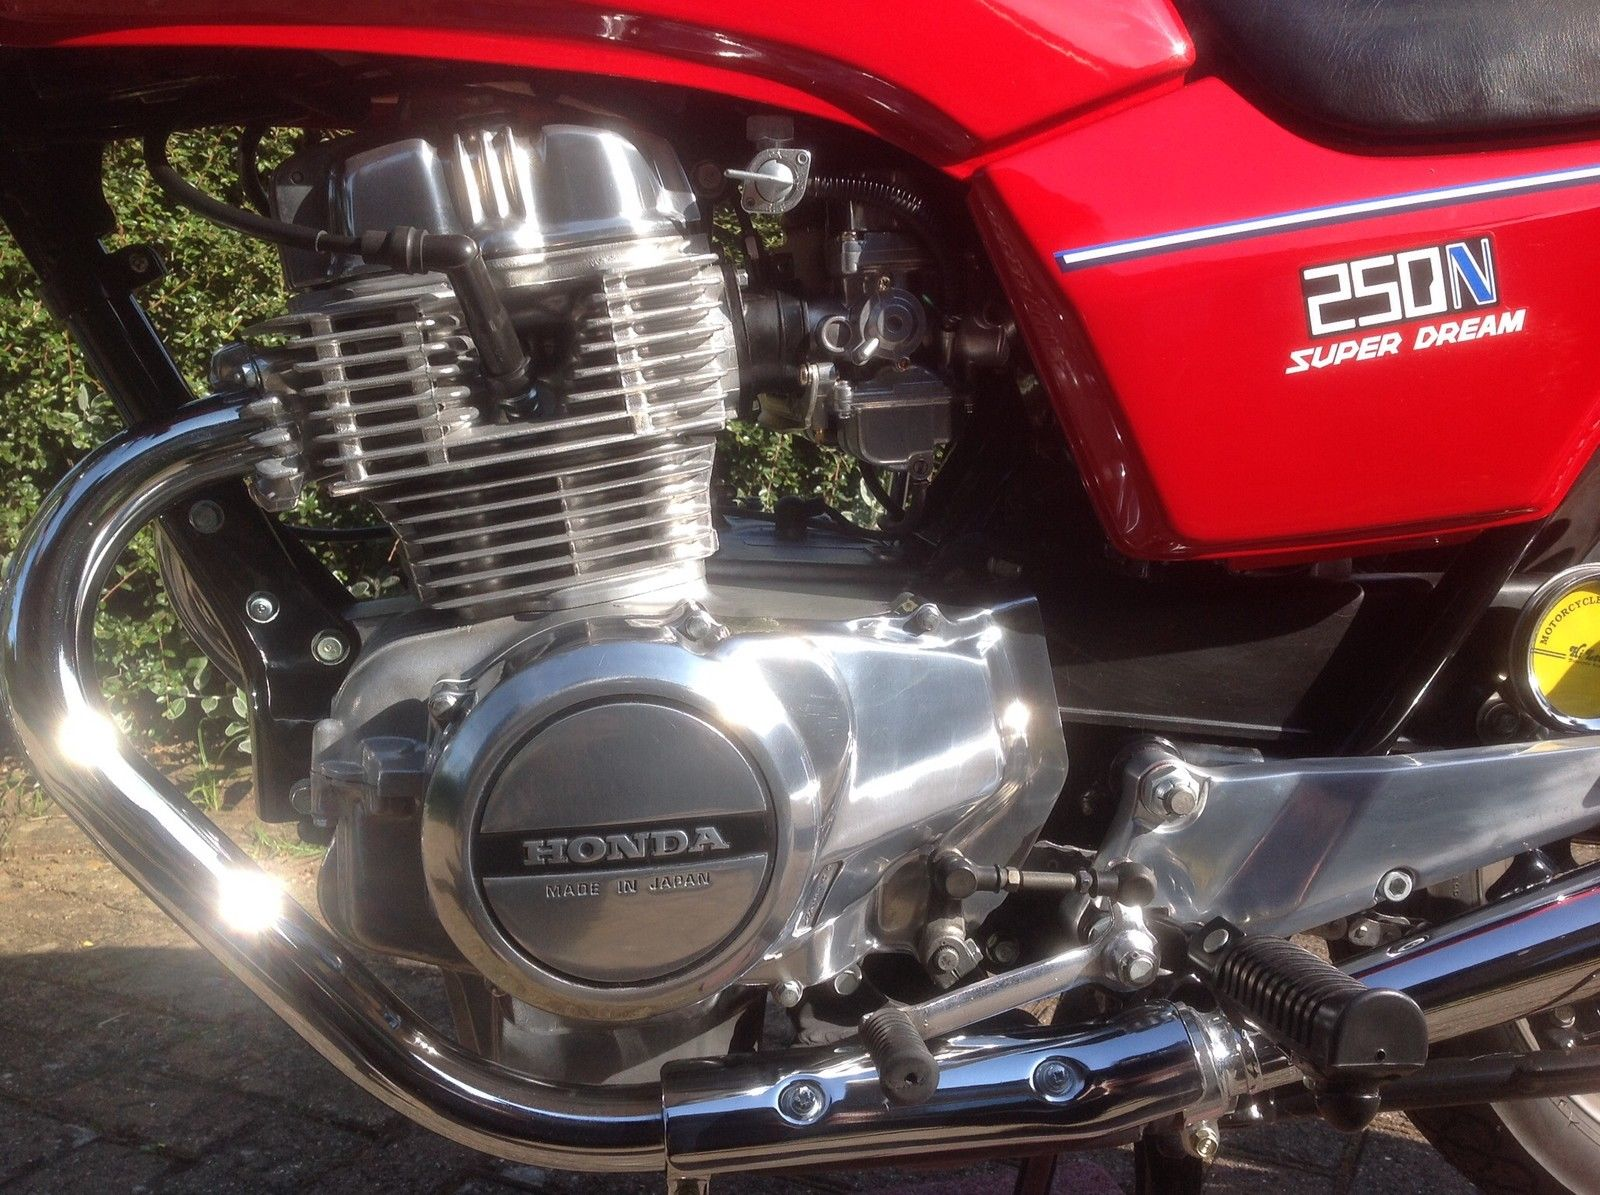 Honda CB250N Superdream - 1979